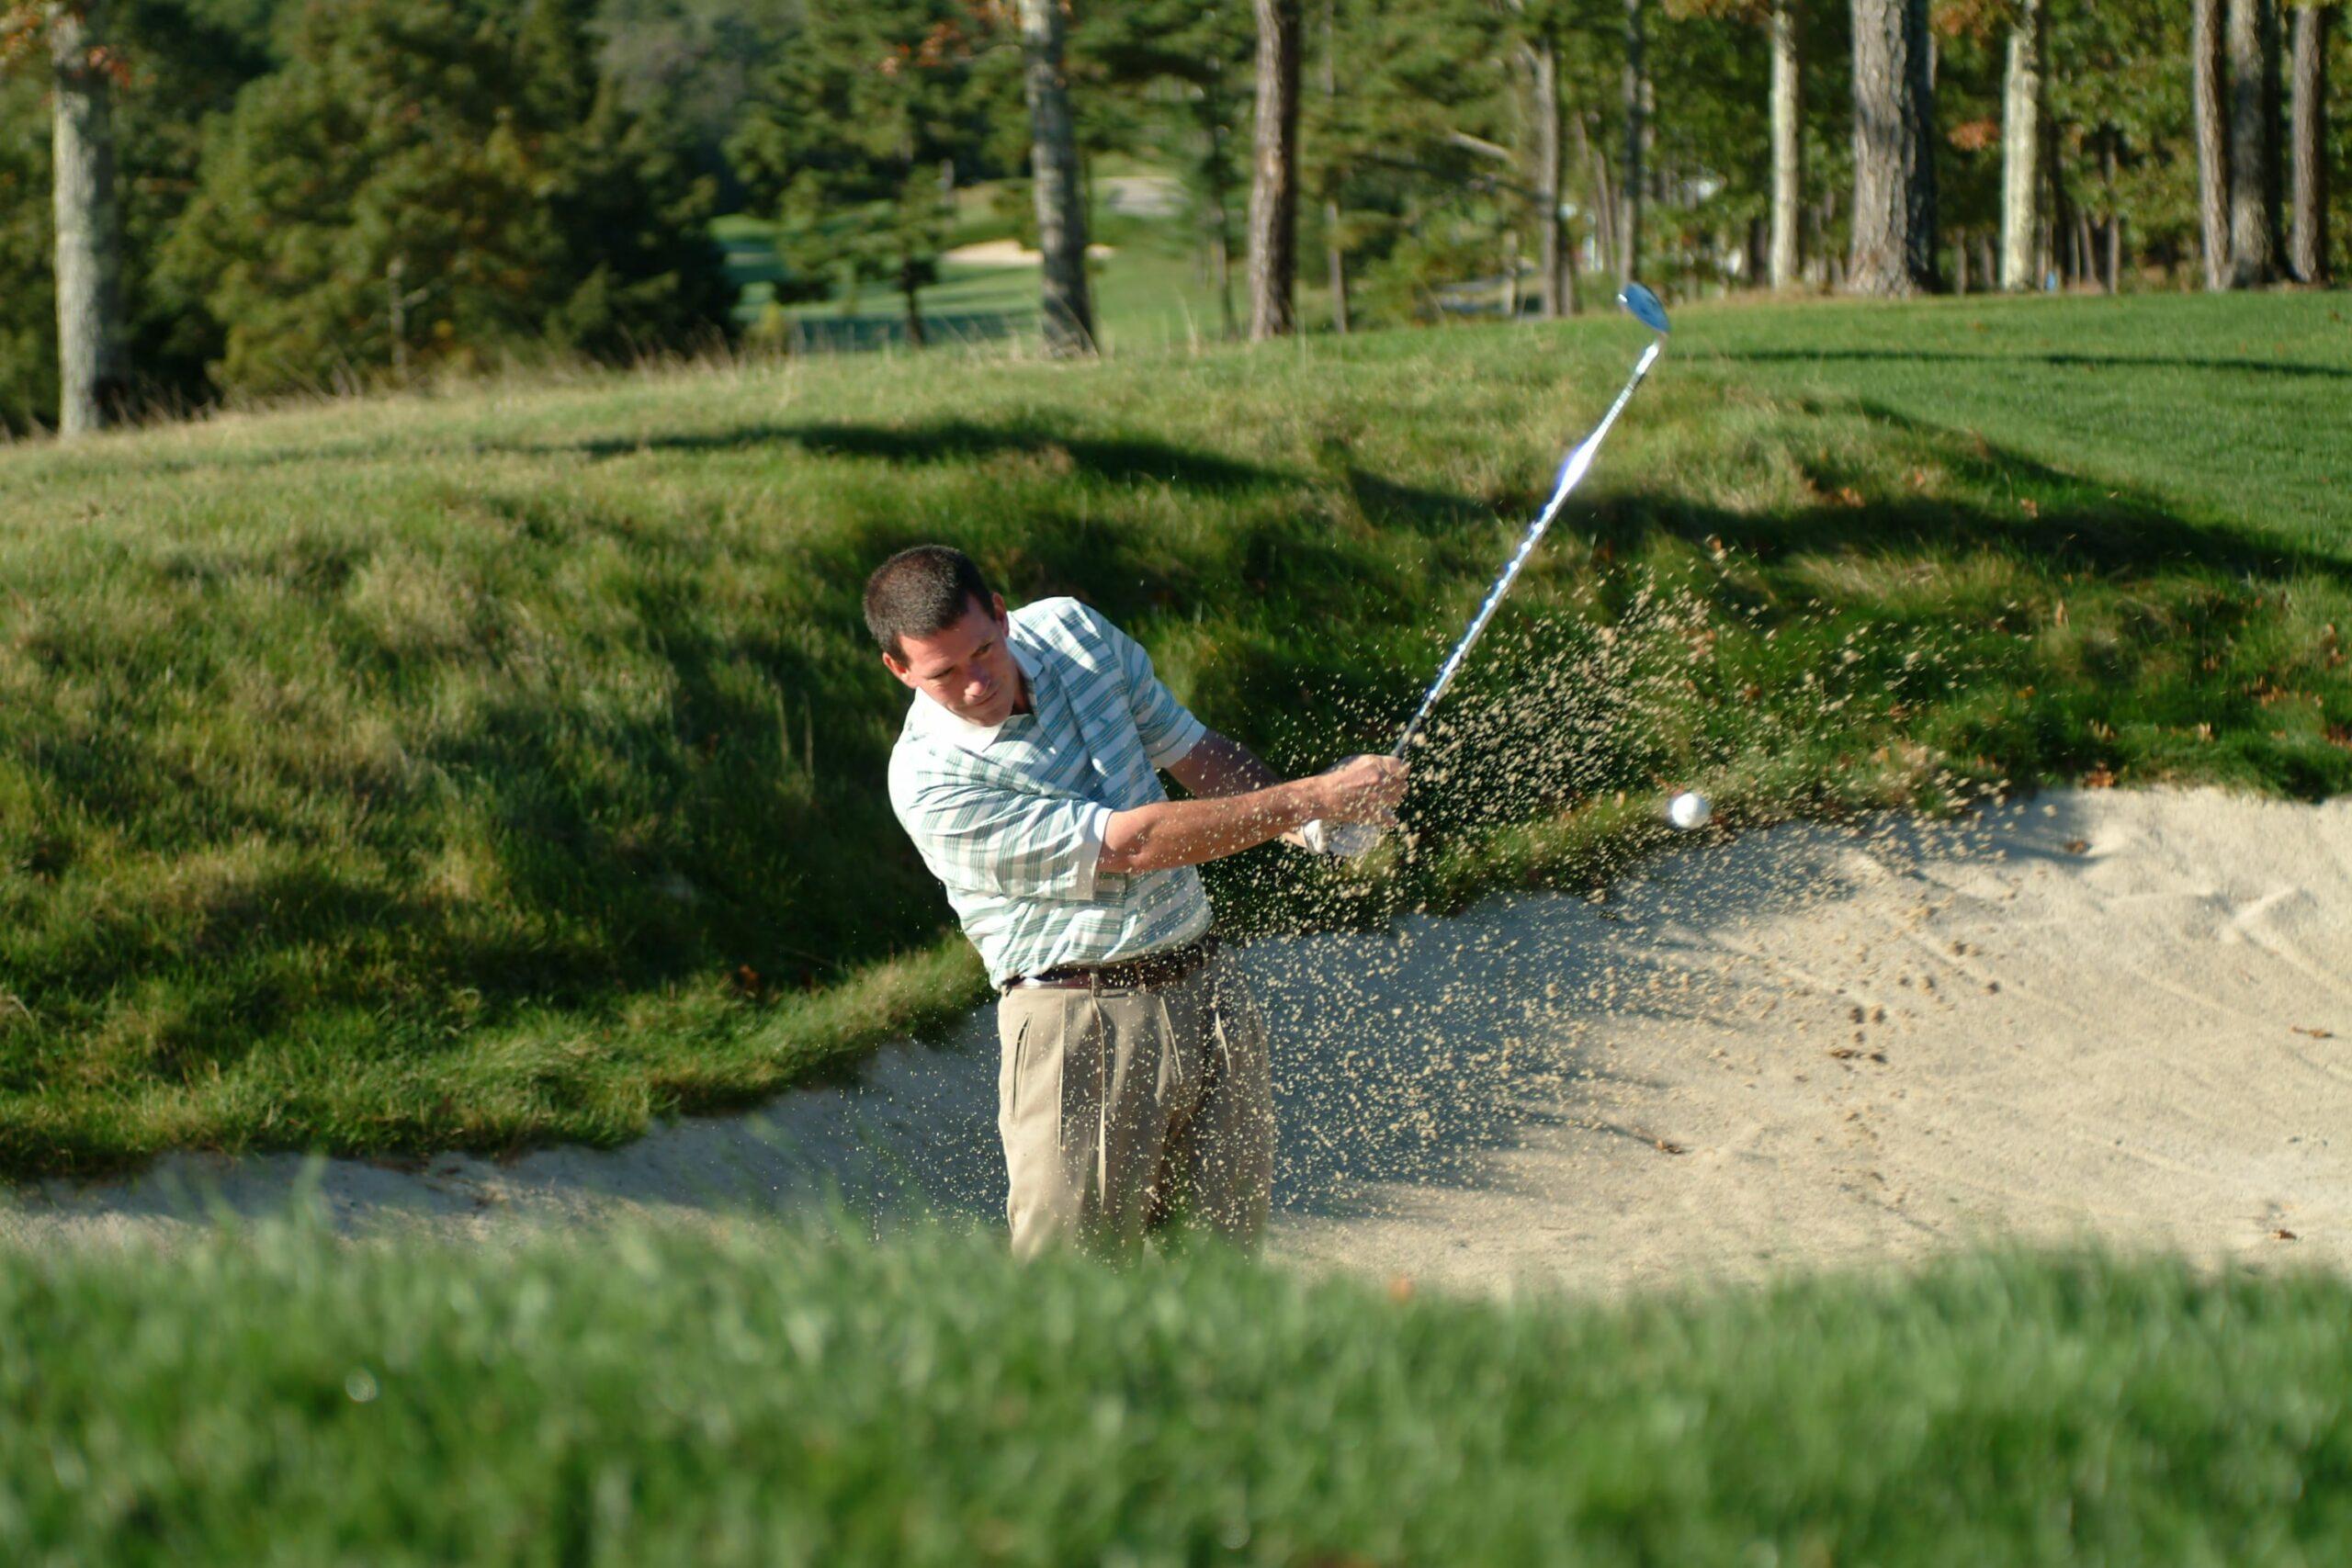 Jim Campbell sand trap action shot